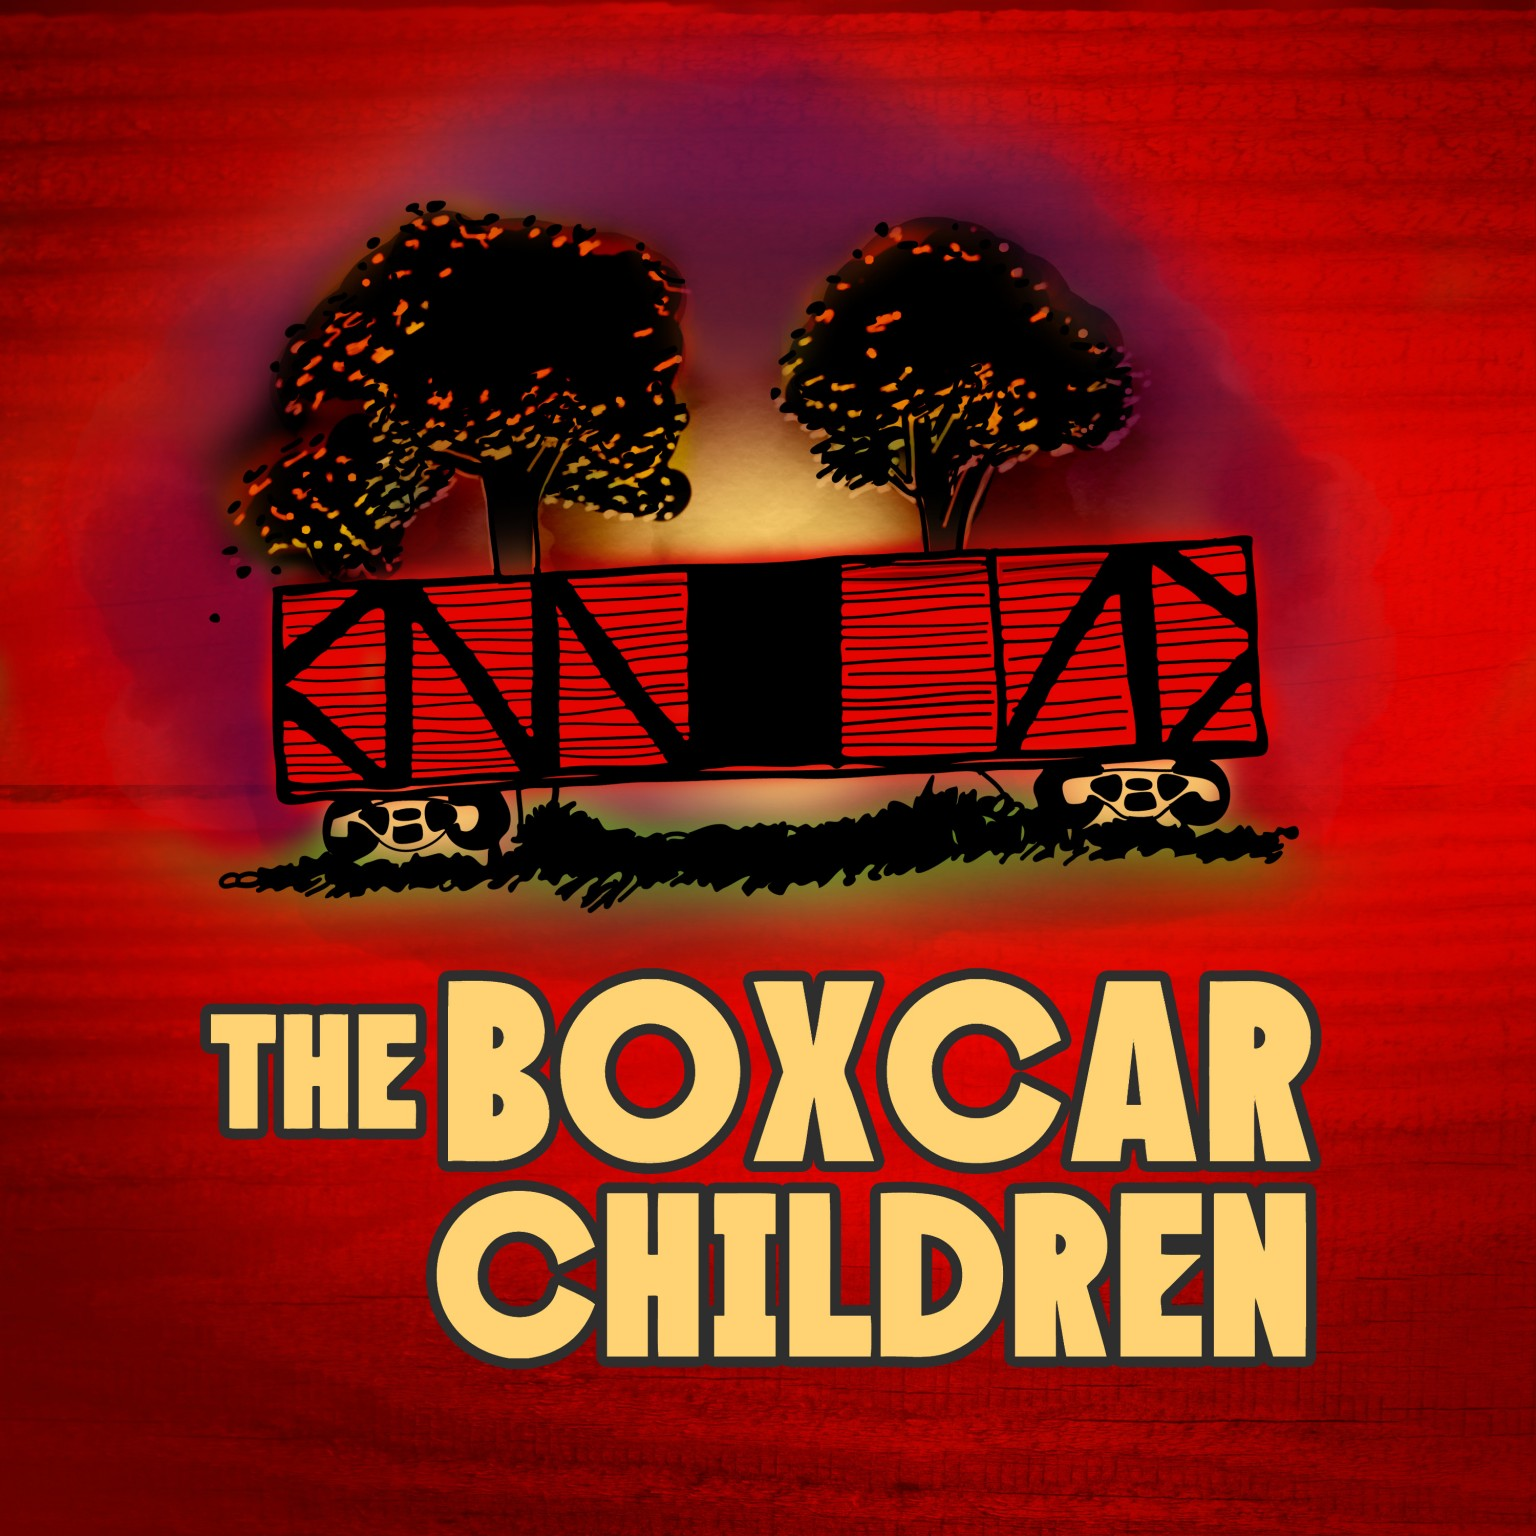 The Boxcar Children | Quincy Community Theatre